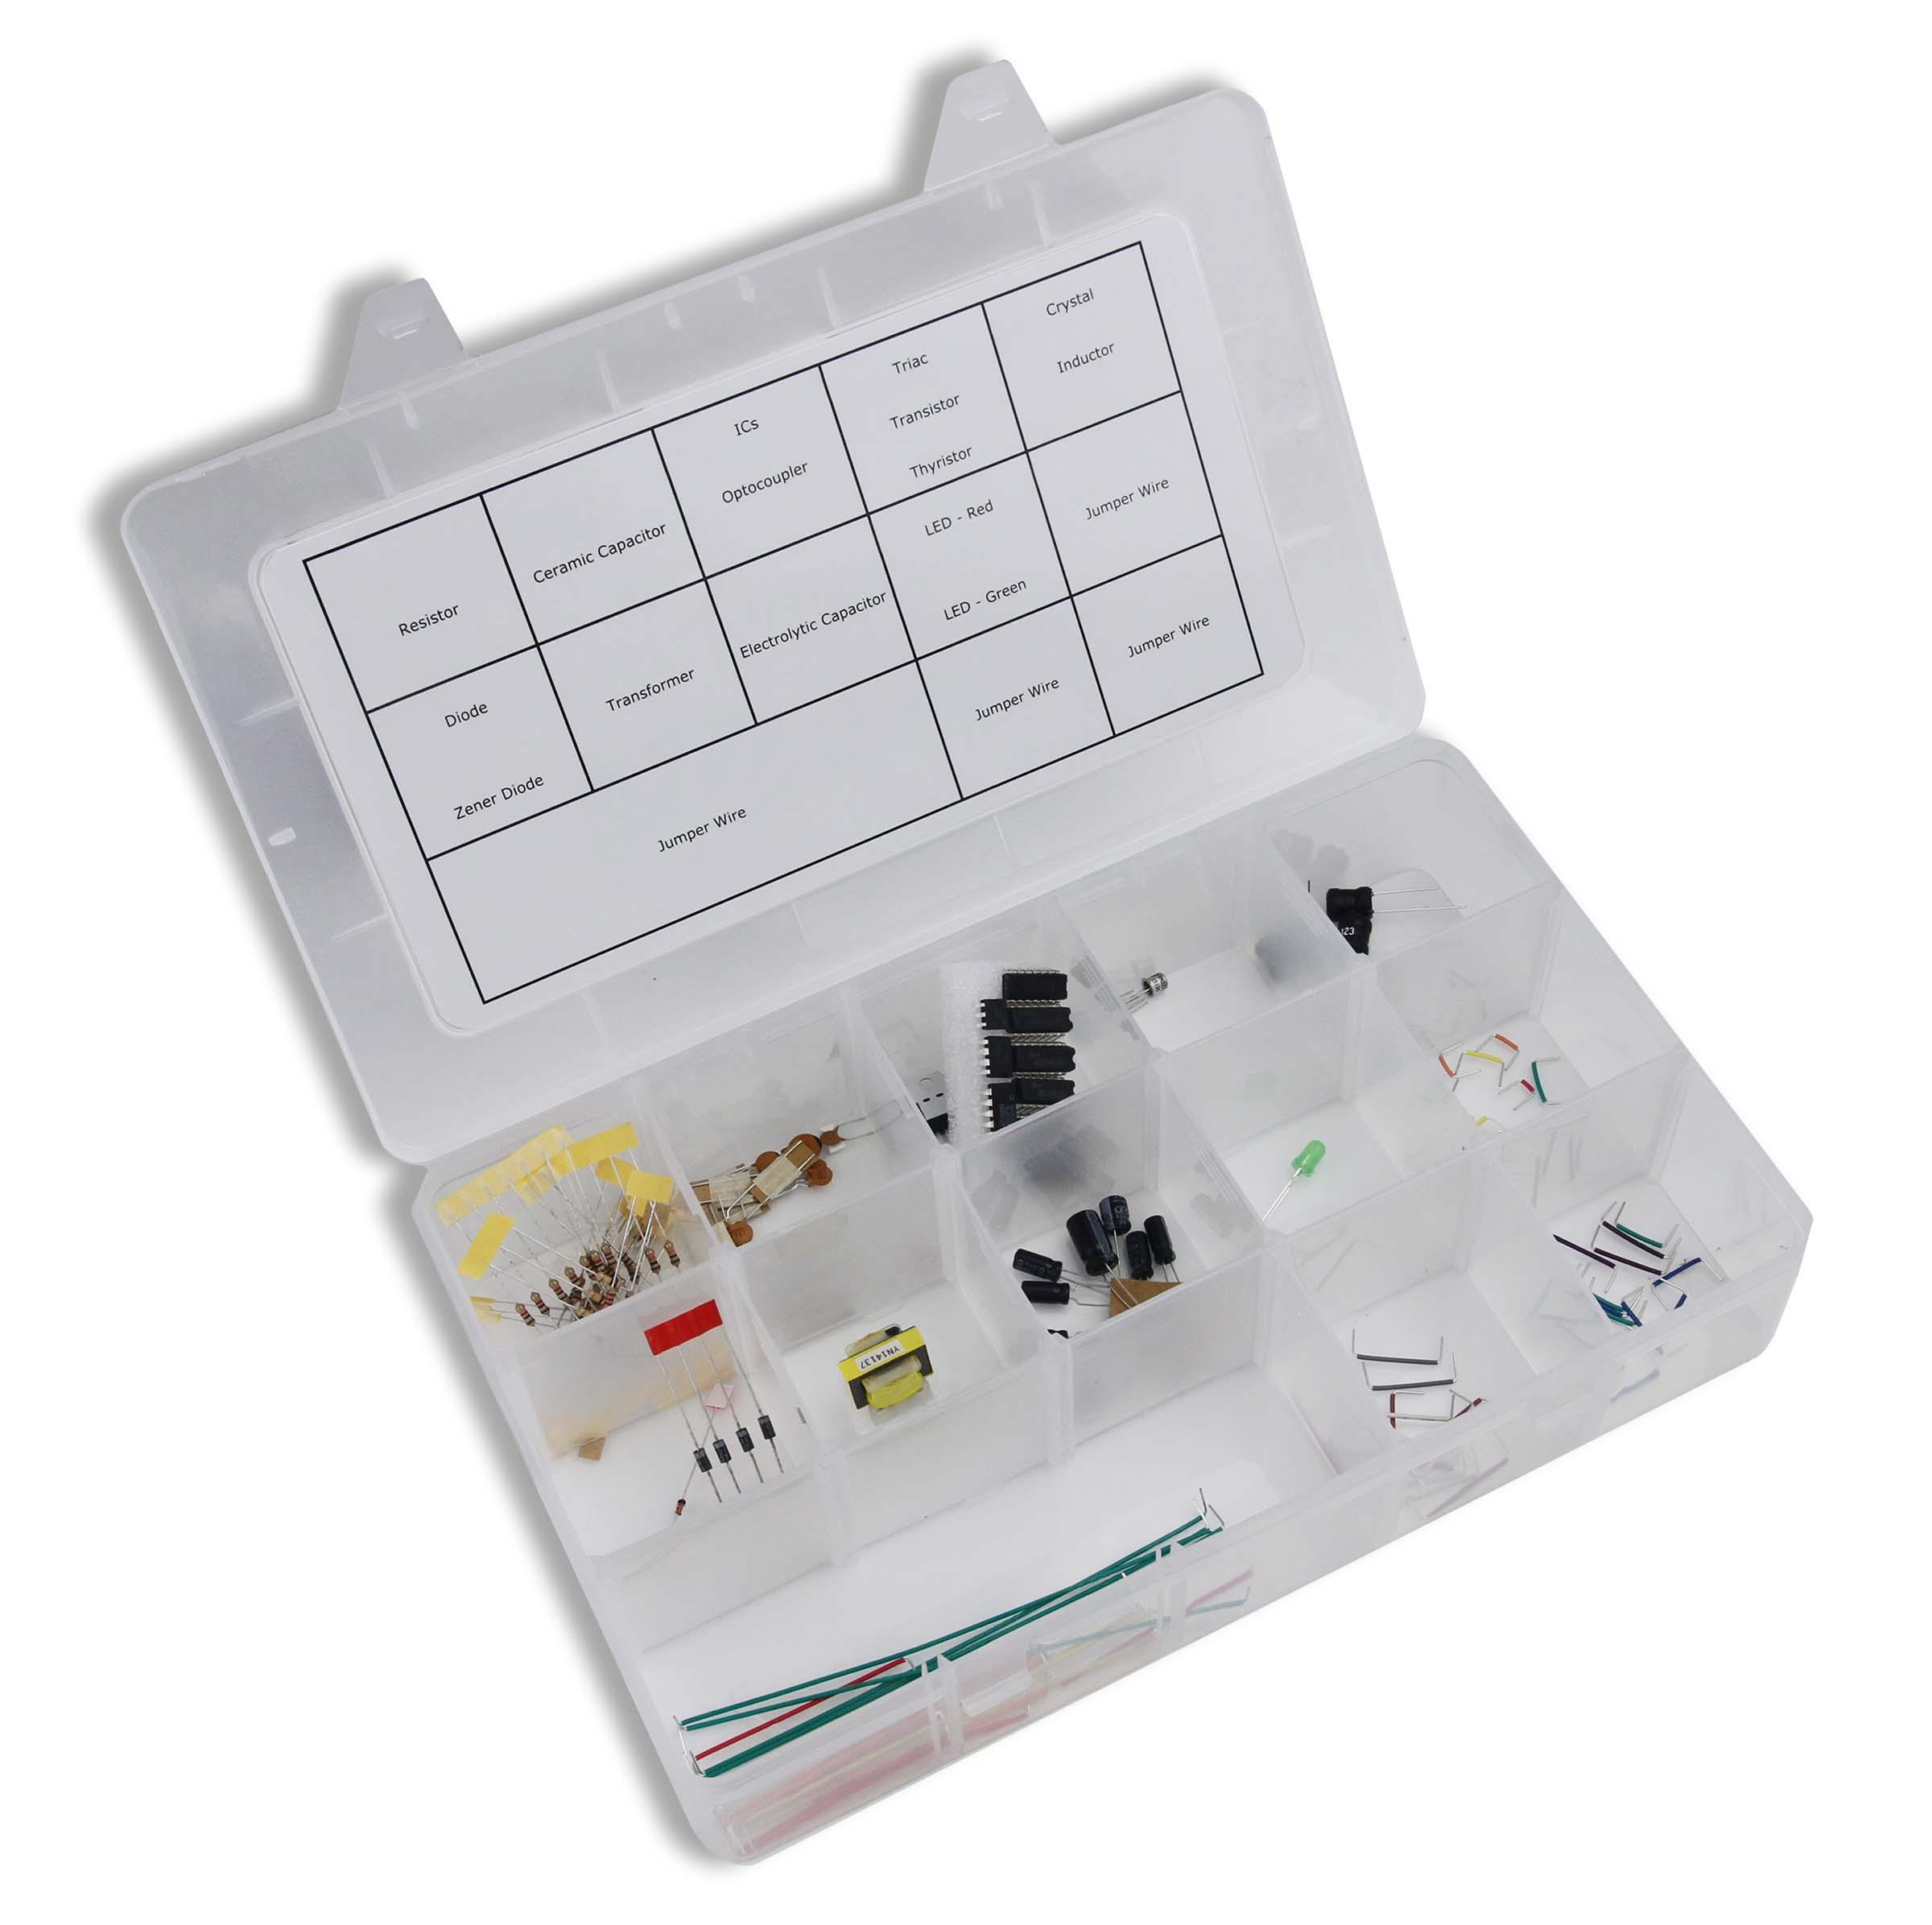 Global Specialties PB-507LAB PB-507 Plus Courseware & Kit Photo